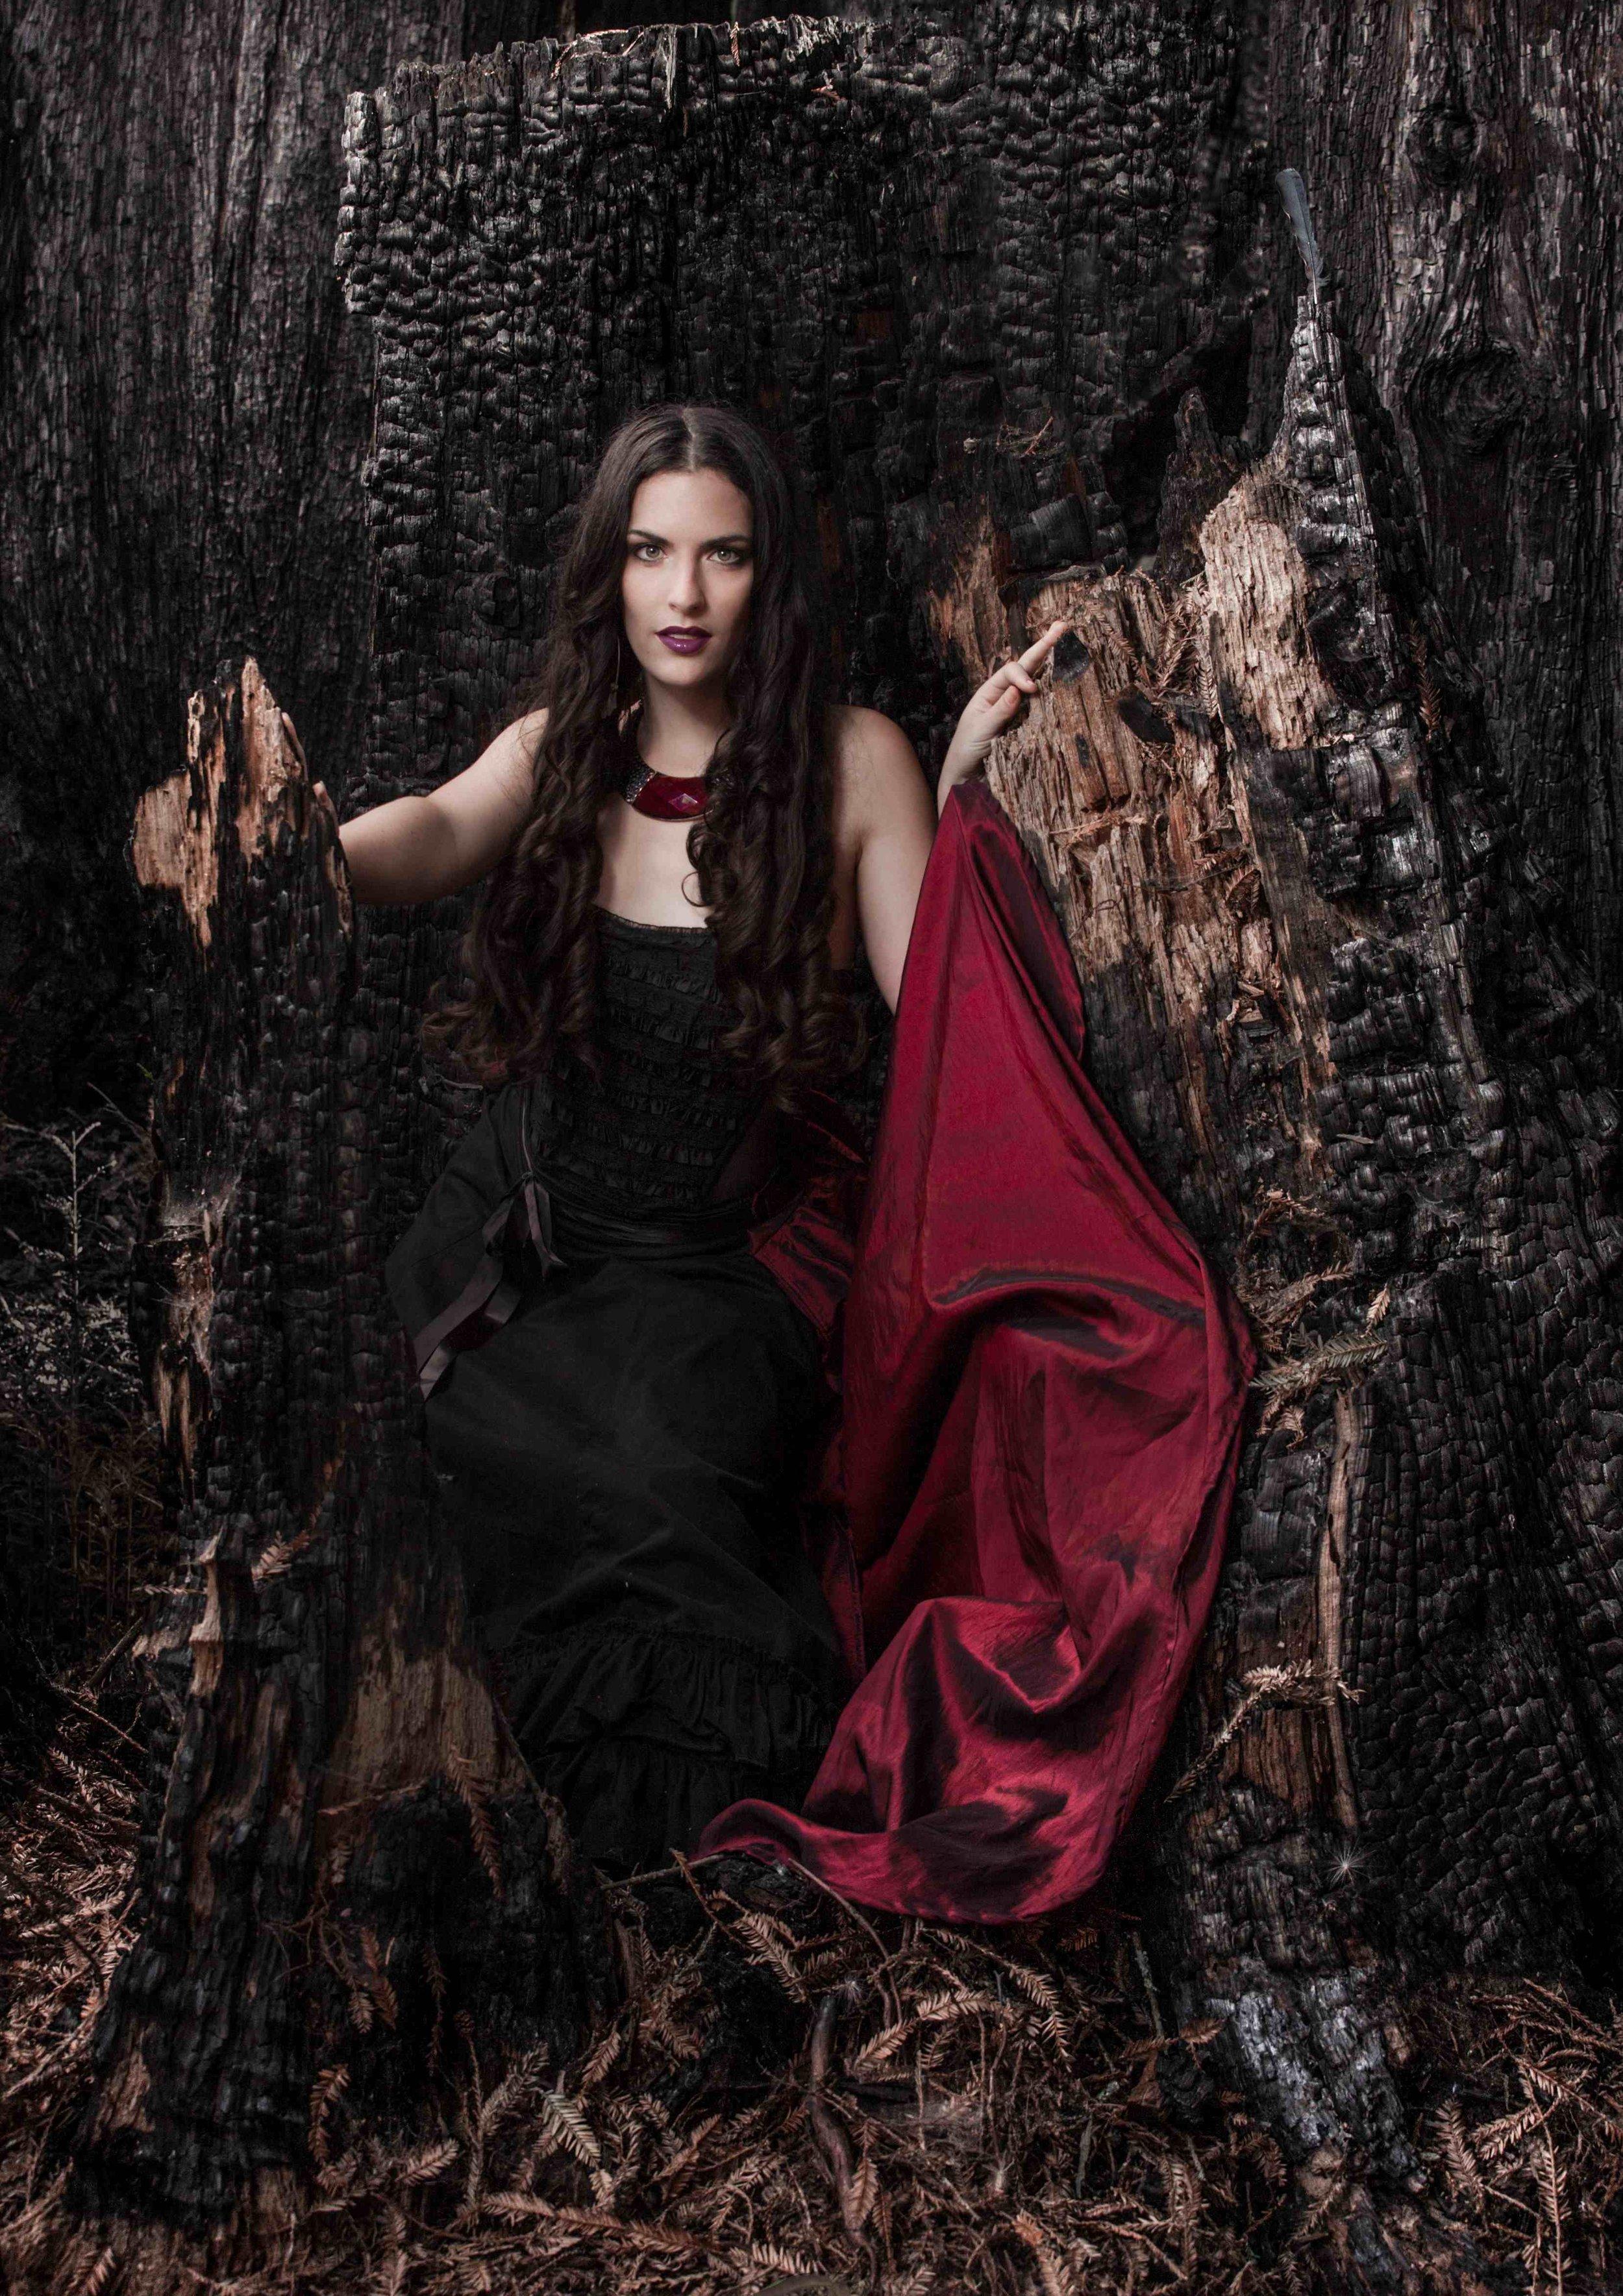 marya_stark_dark_mother_queen_of_the_night_fire_throne_scarlet_moon.jpg